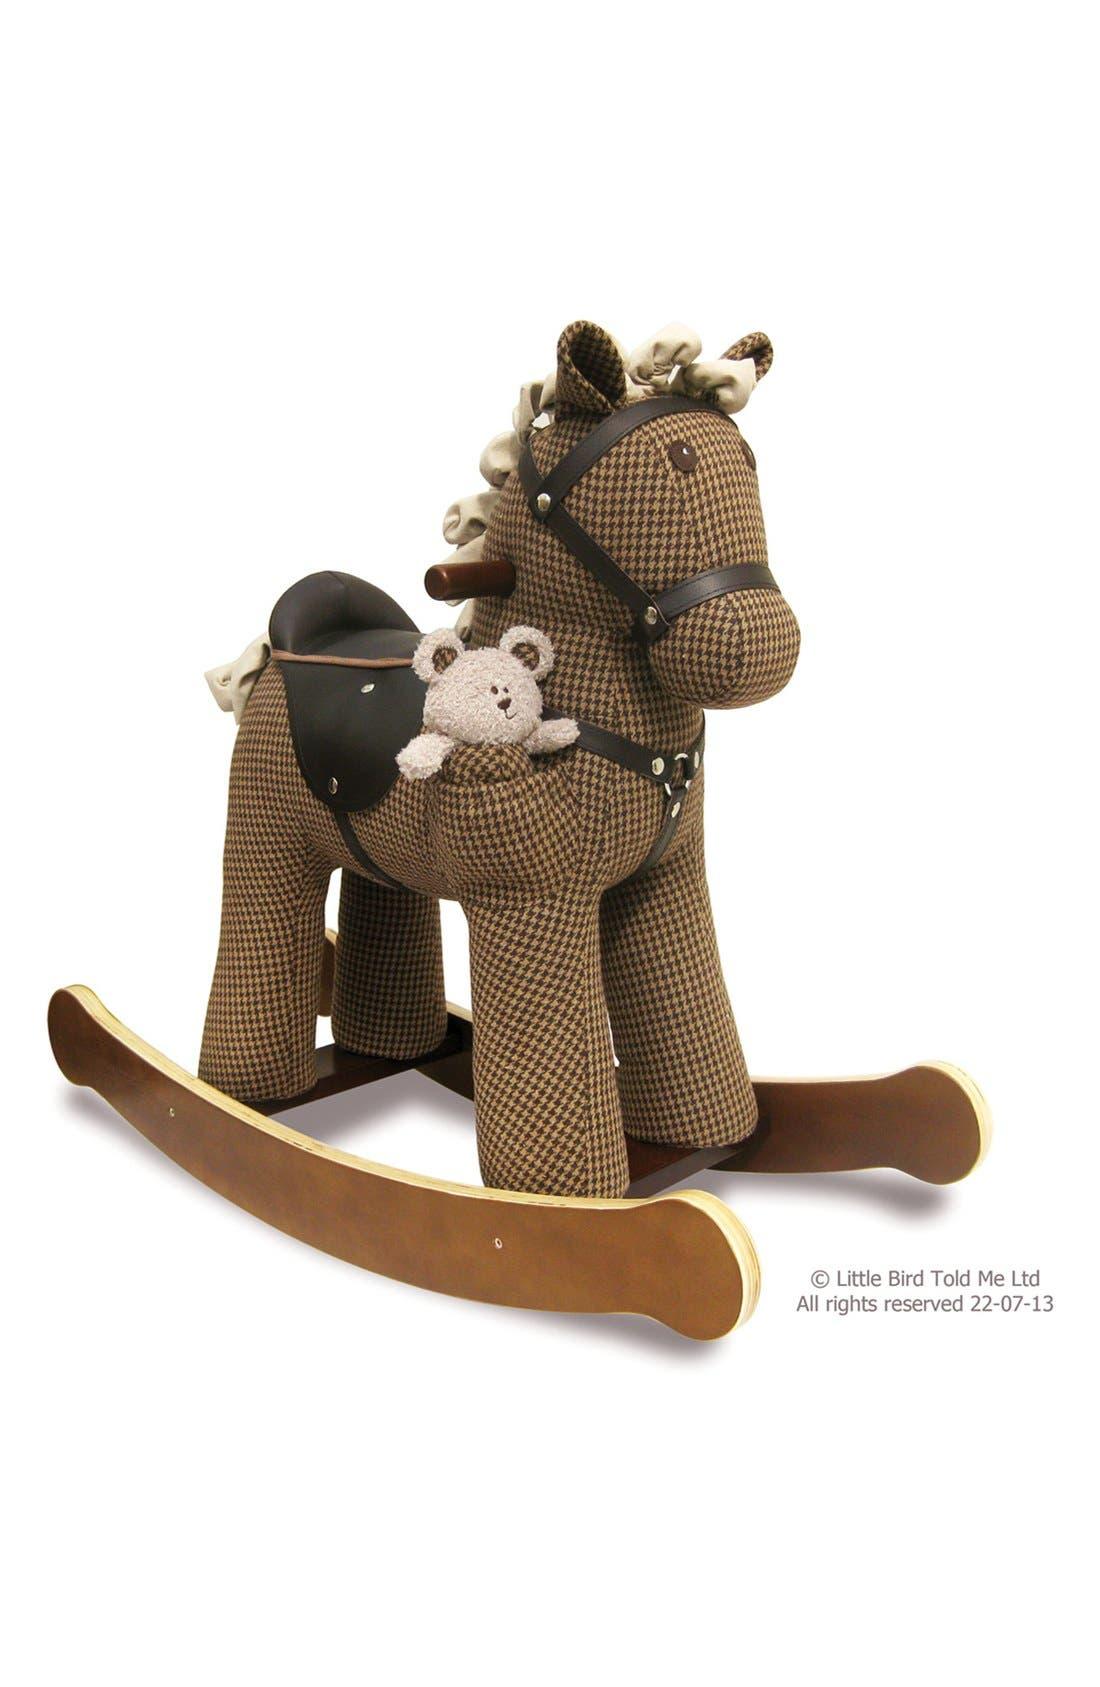 Main Image - Little Bird Told Me Rocking Horse & Stuffed Animal